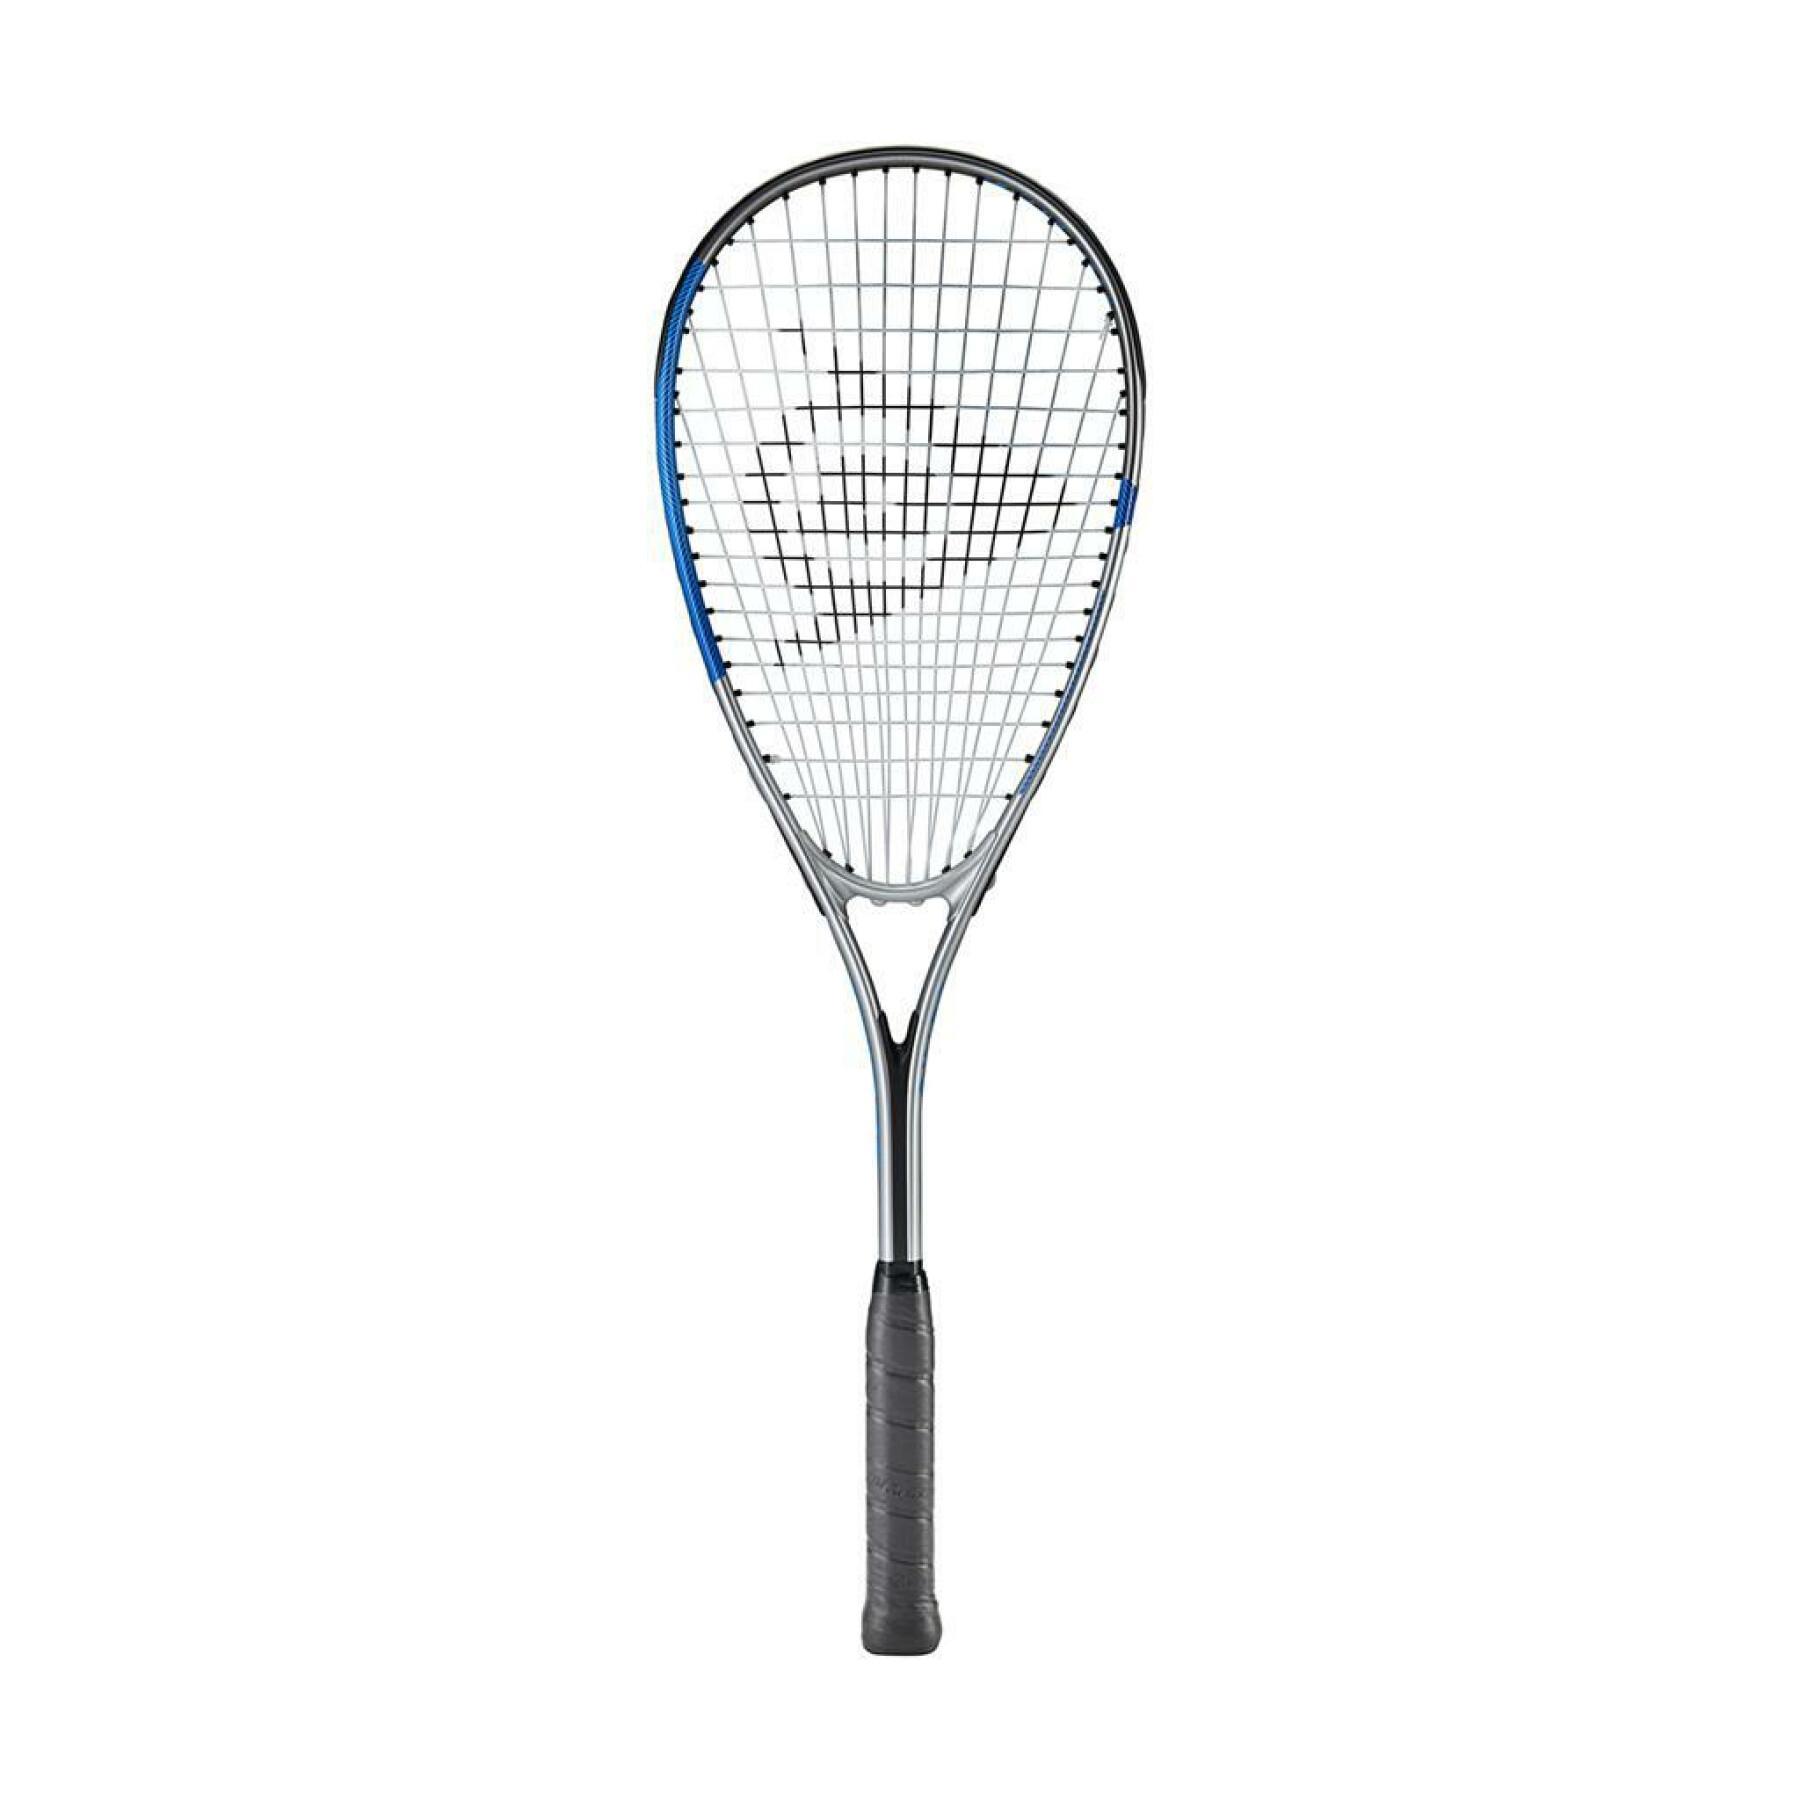 Racket Dunlop sonic lite ti 5.0